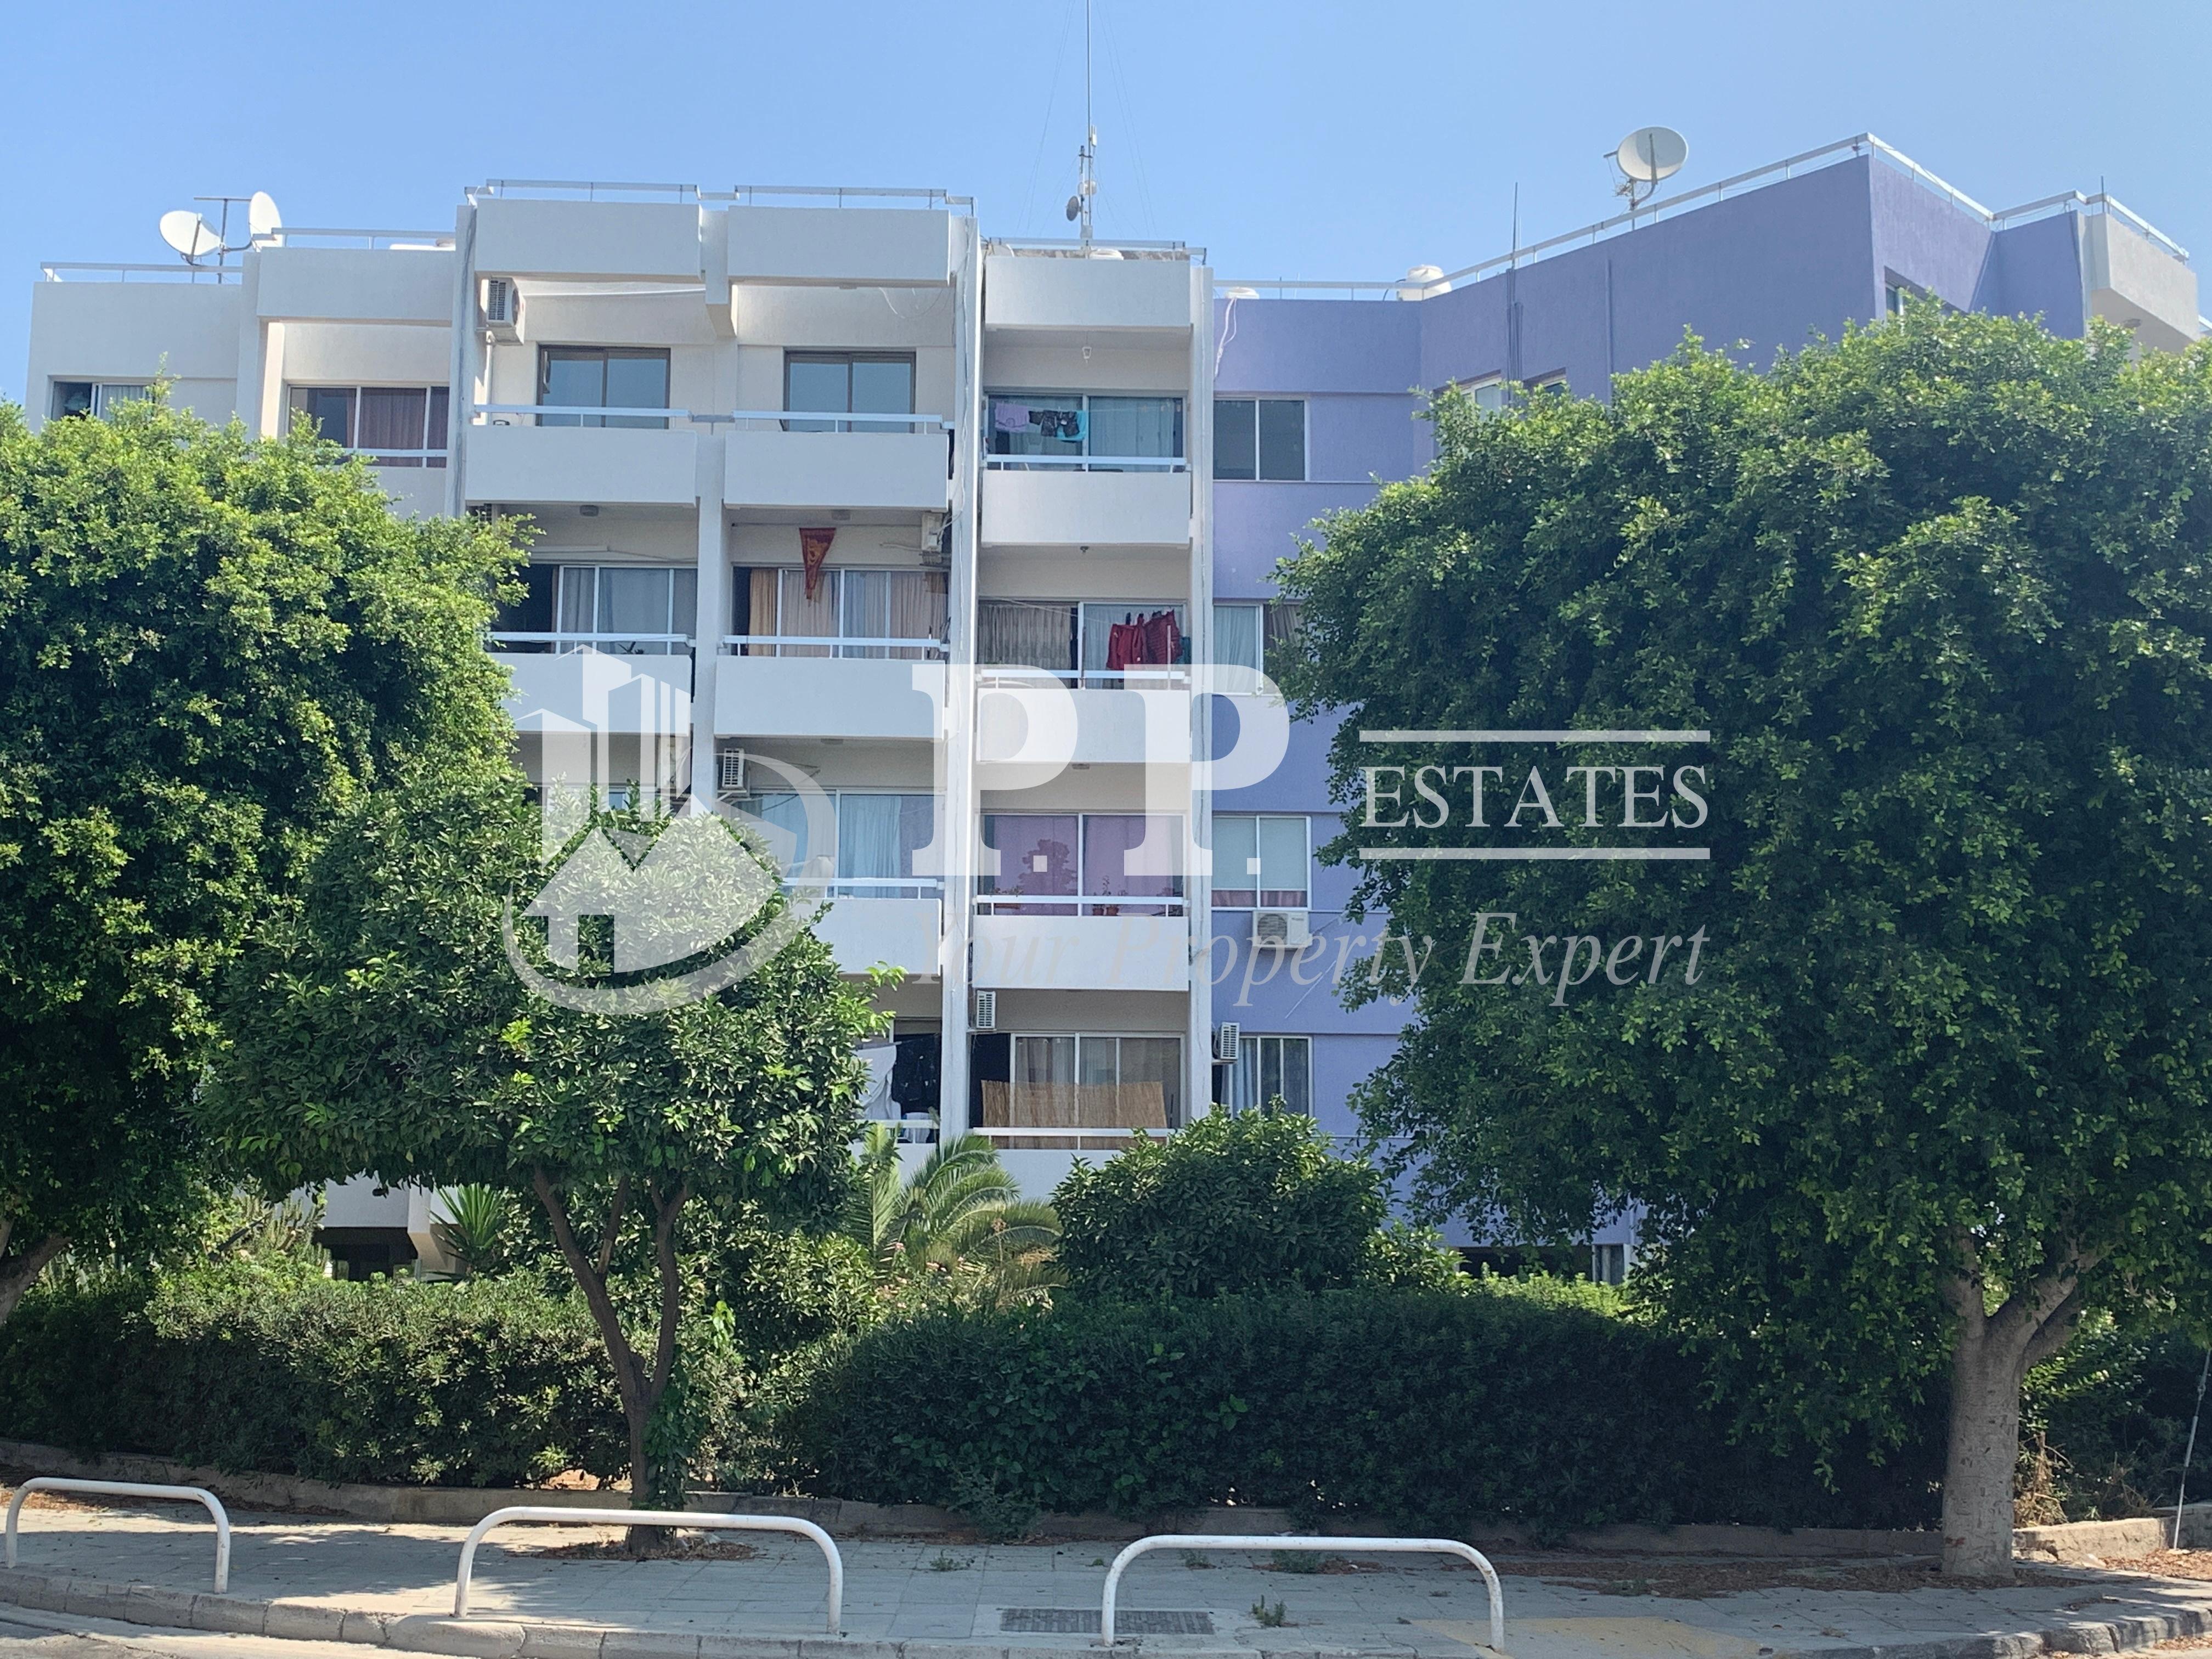 Cyprus Real Estate Agency in Limassol | PP Estates